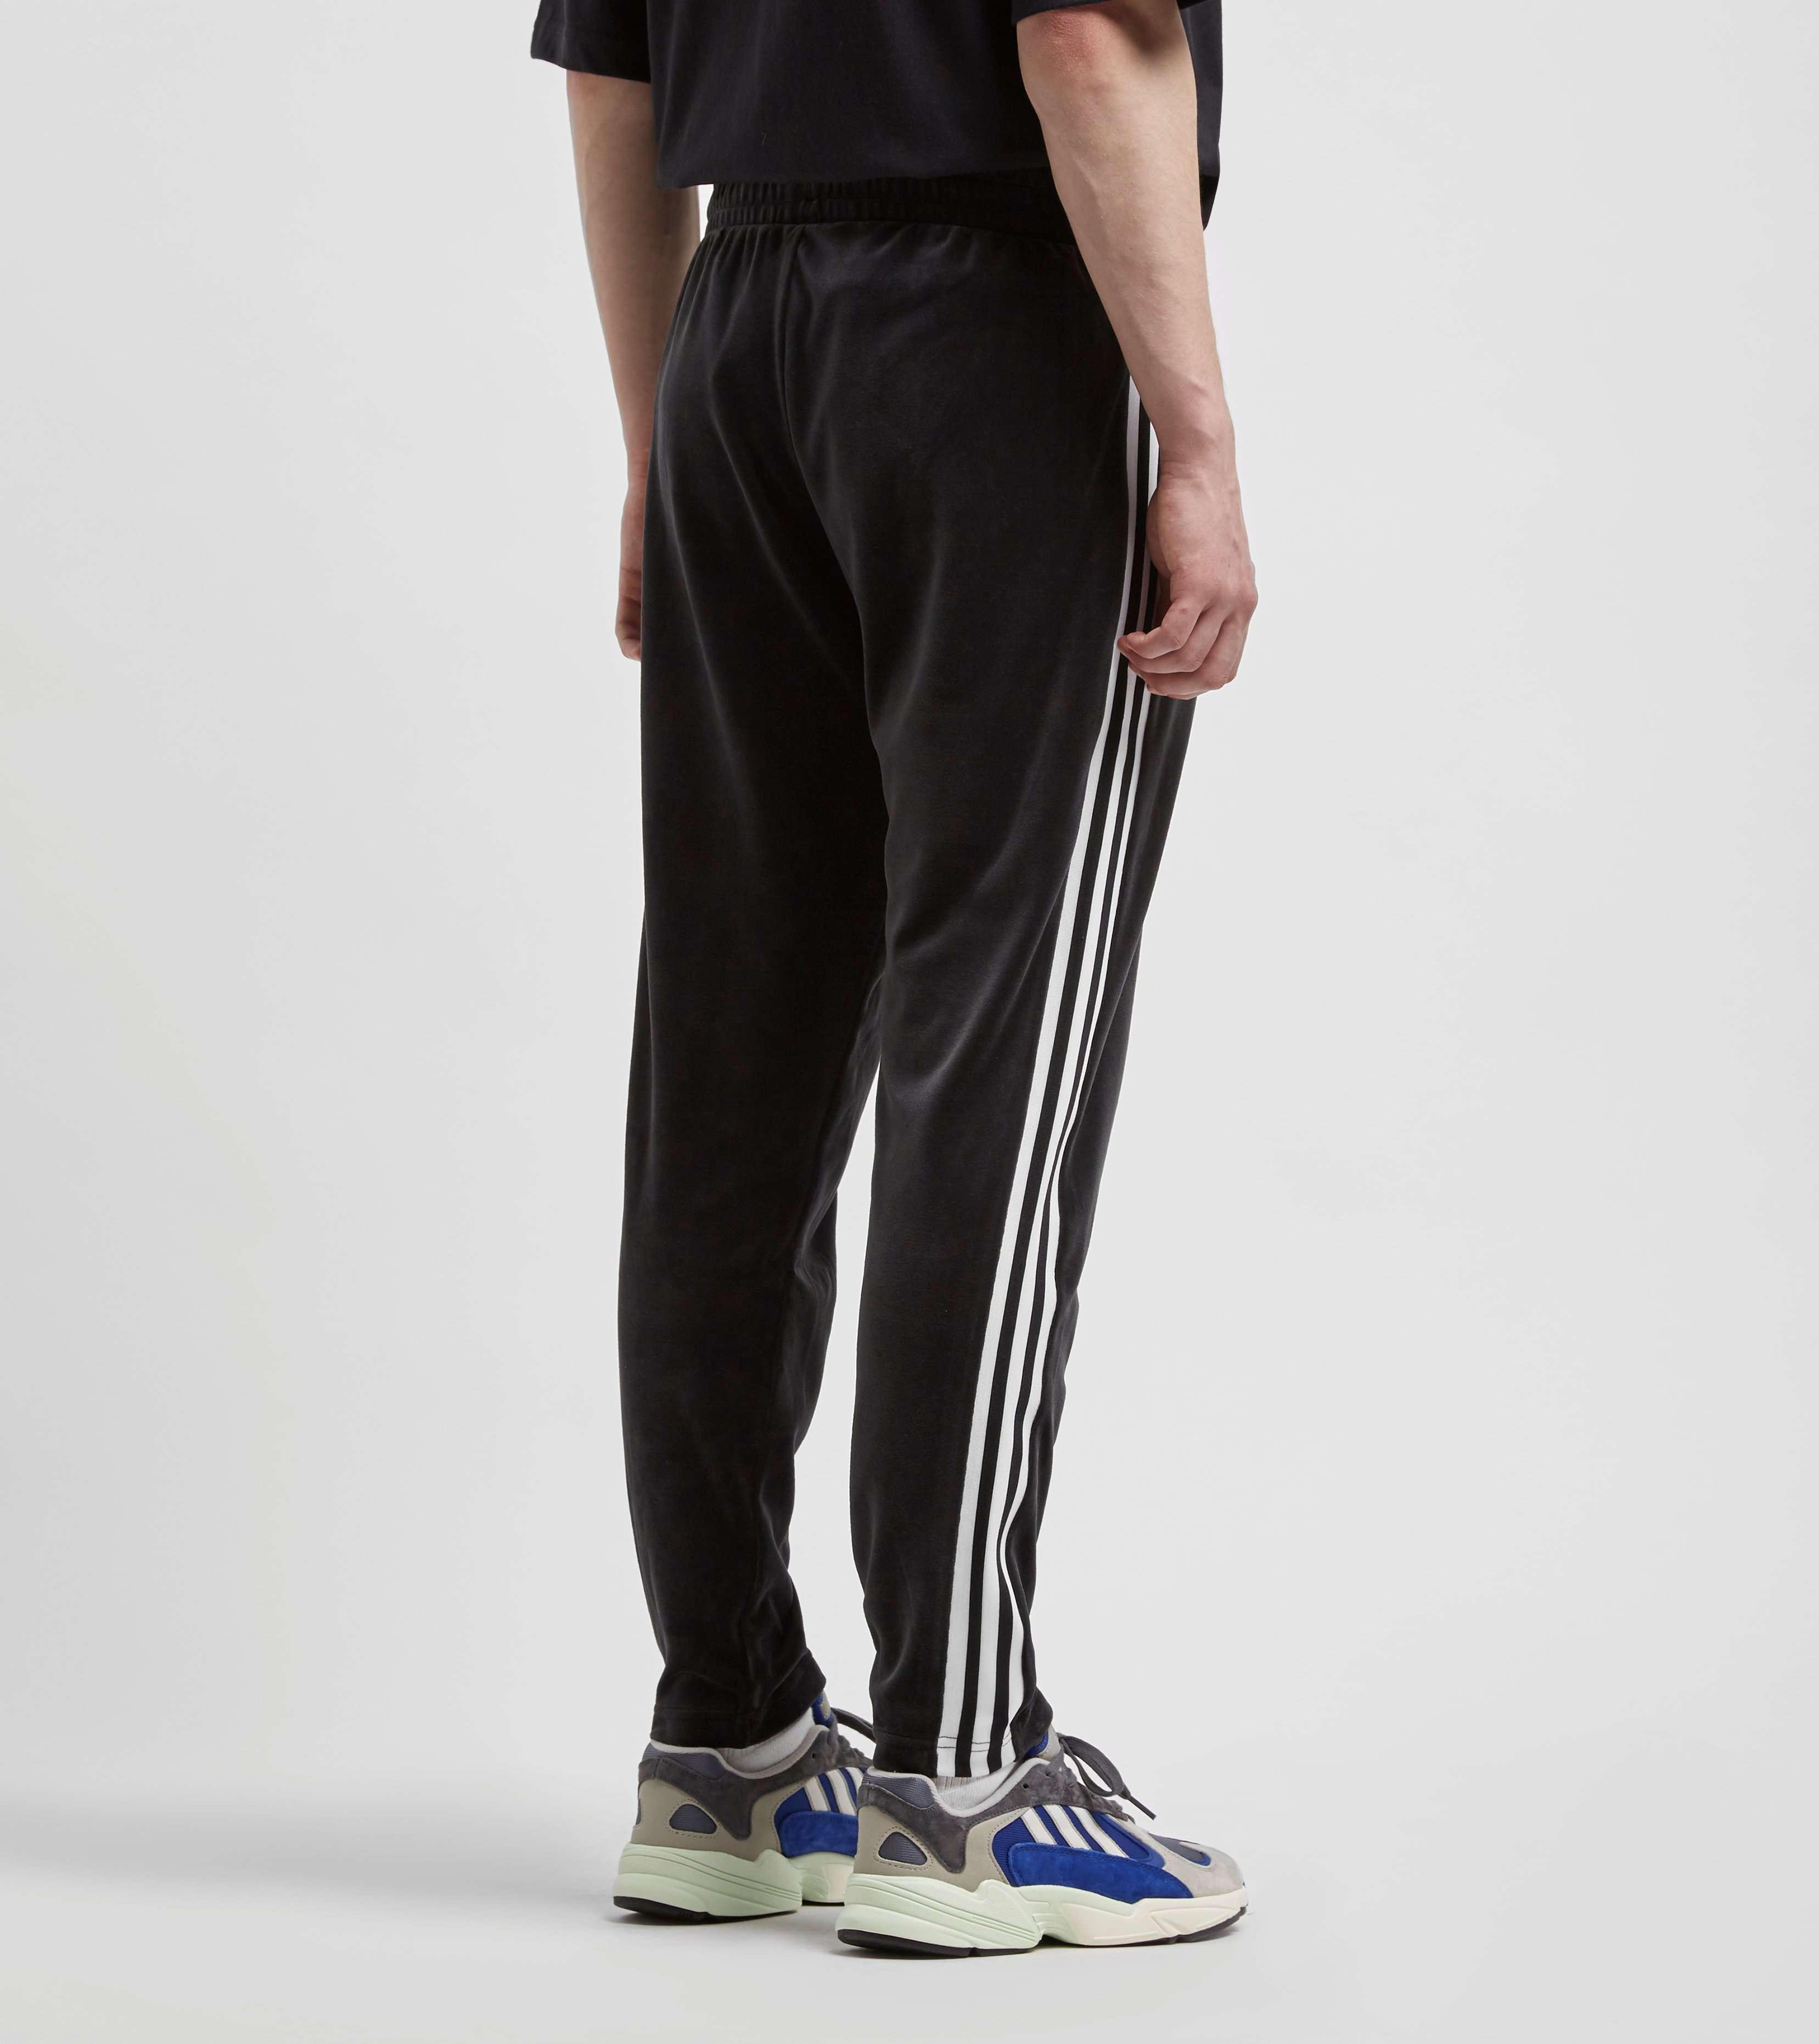 adidas Originals Cozy Track Pants